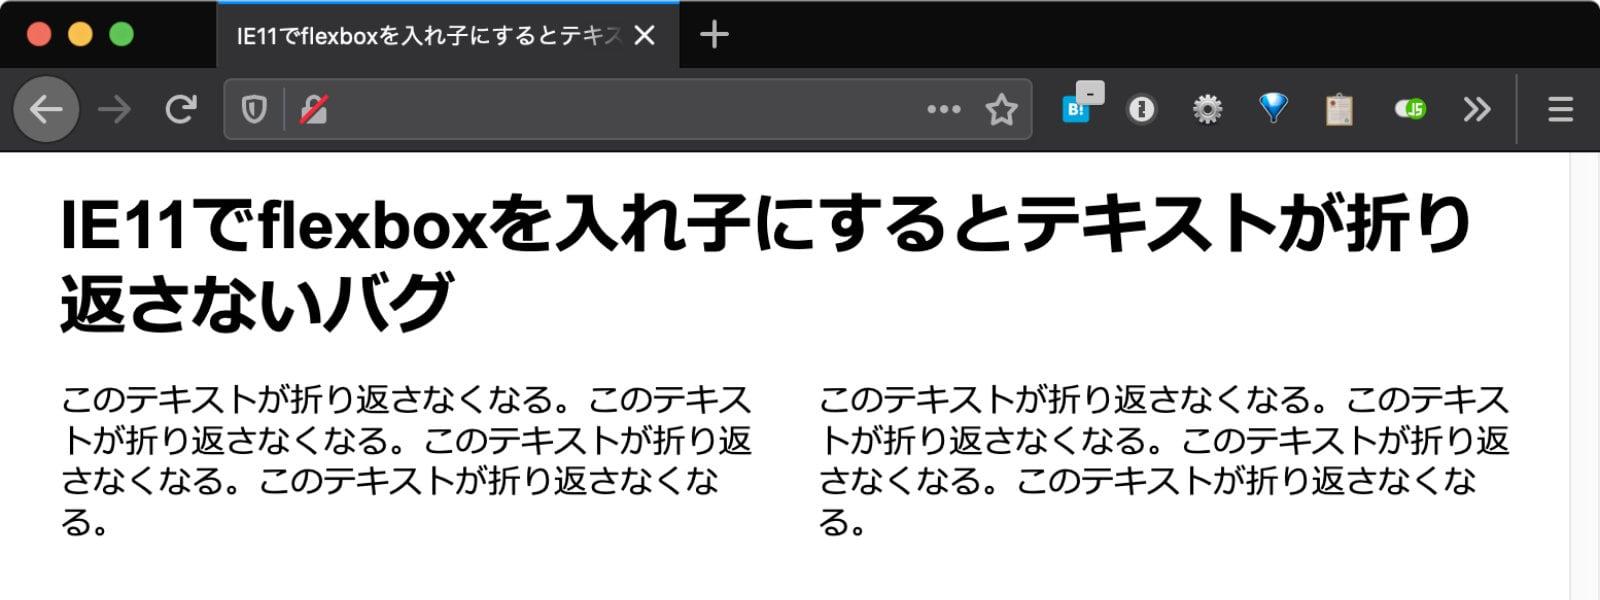 Firefoxでの表示をキャプチャした画像